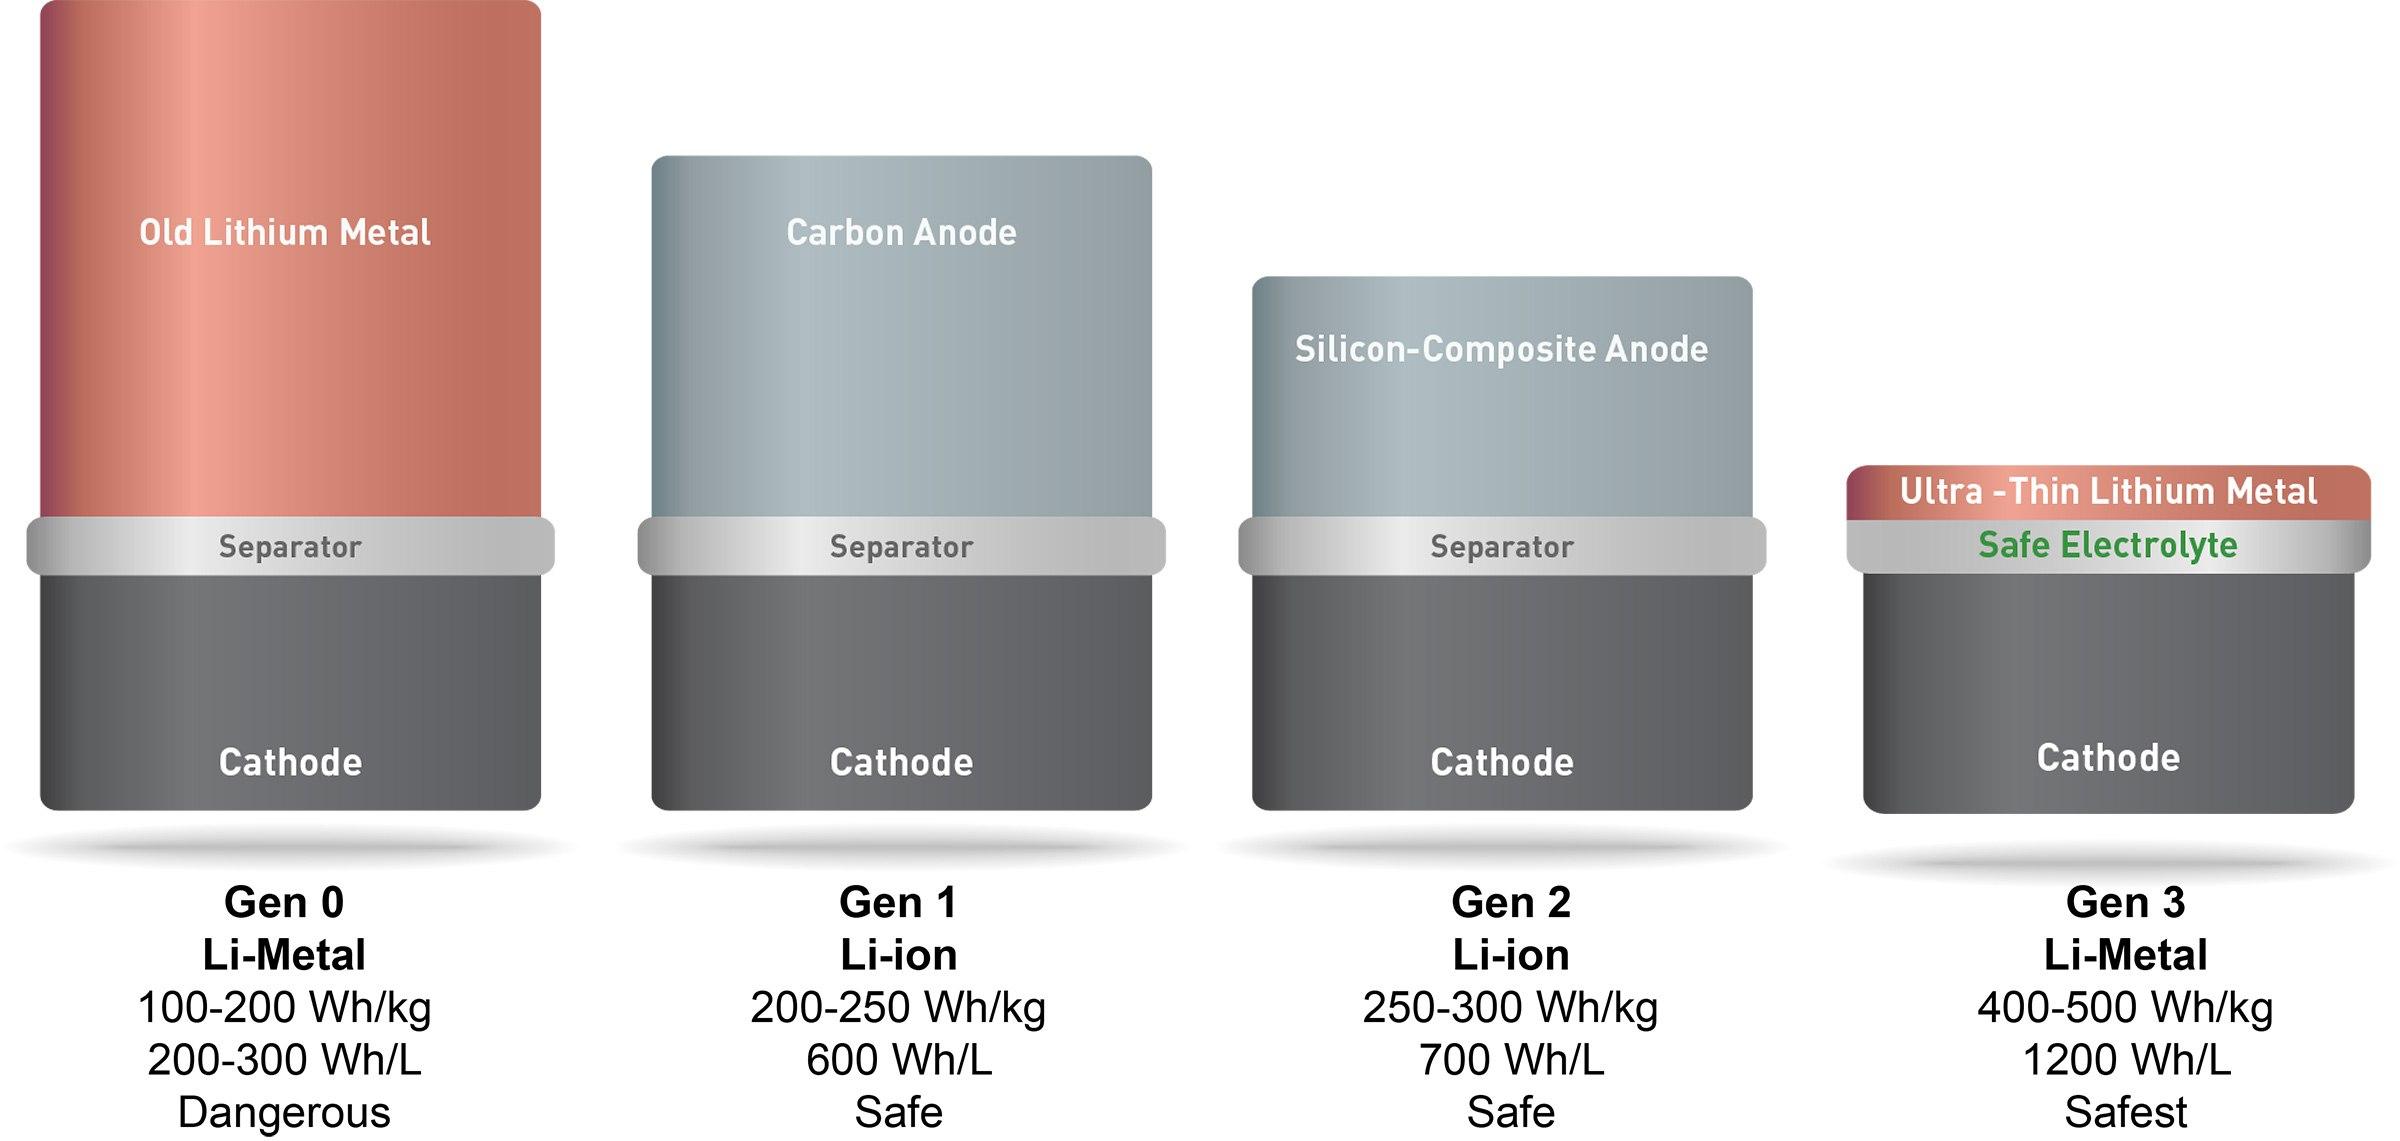 solidenergy graphique